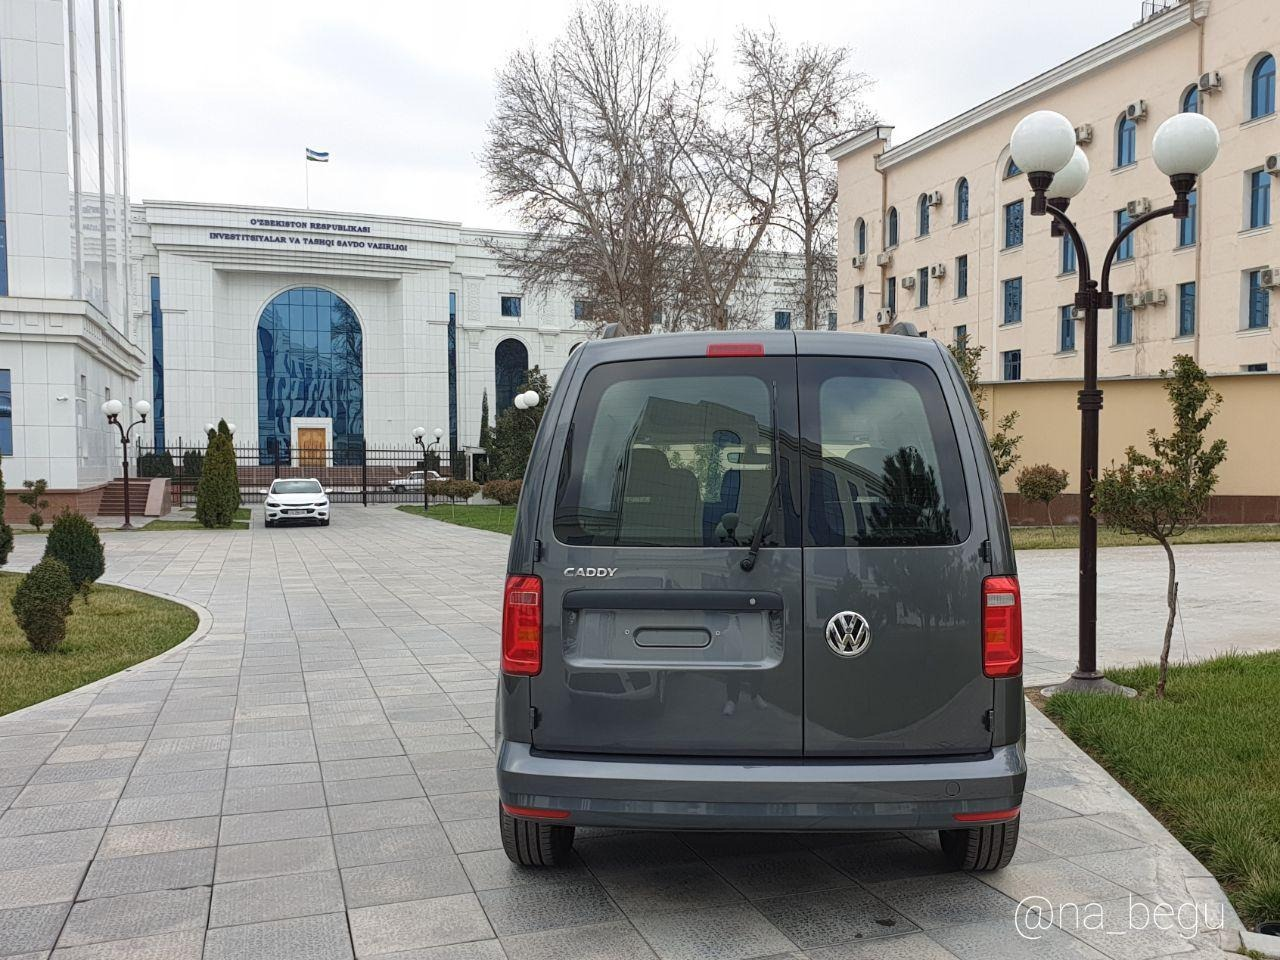 Volkswagen Caddy Narxi - Цена на Кэдди в Узбекистане - 15